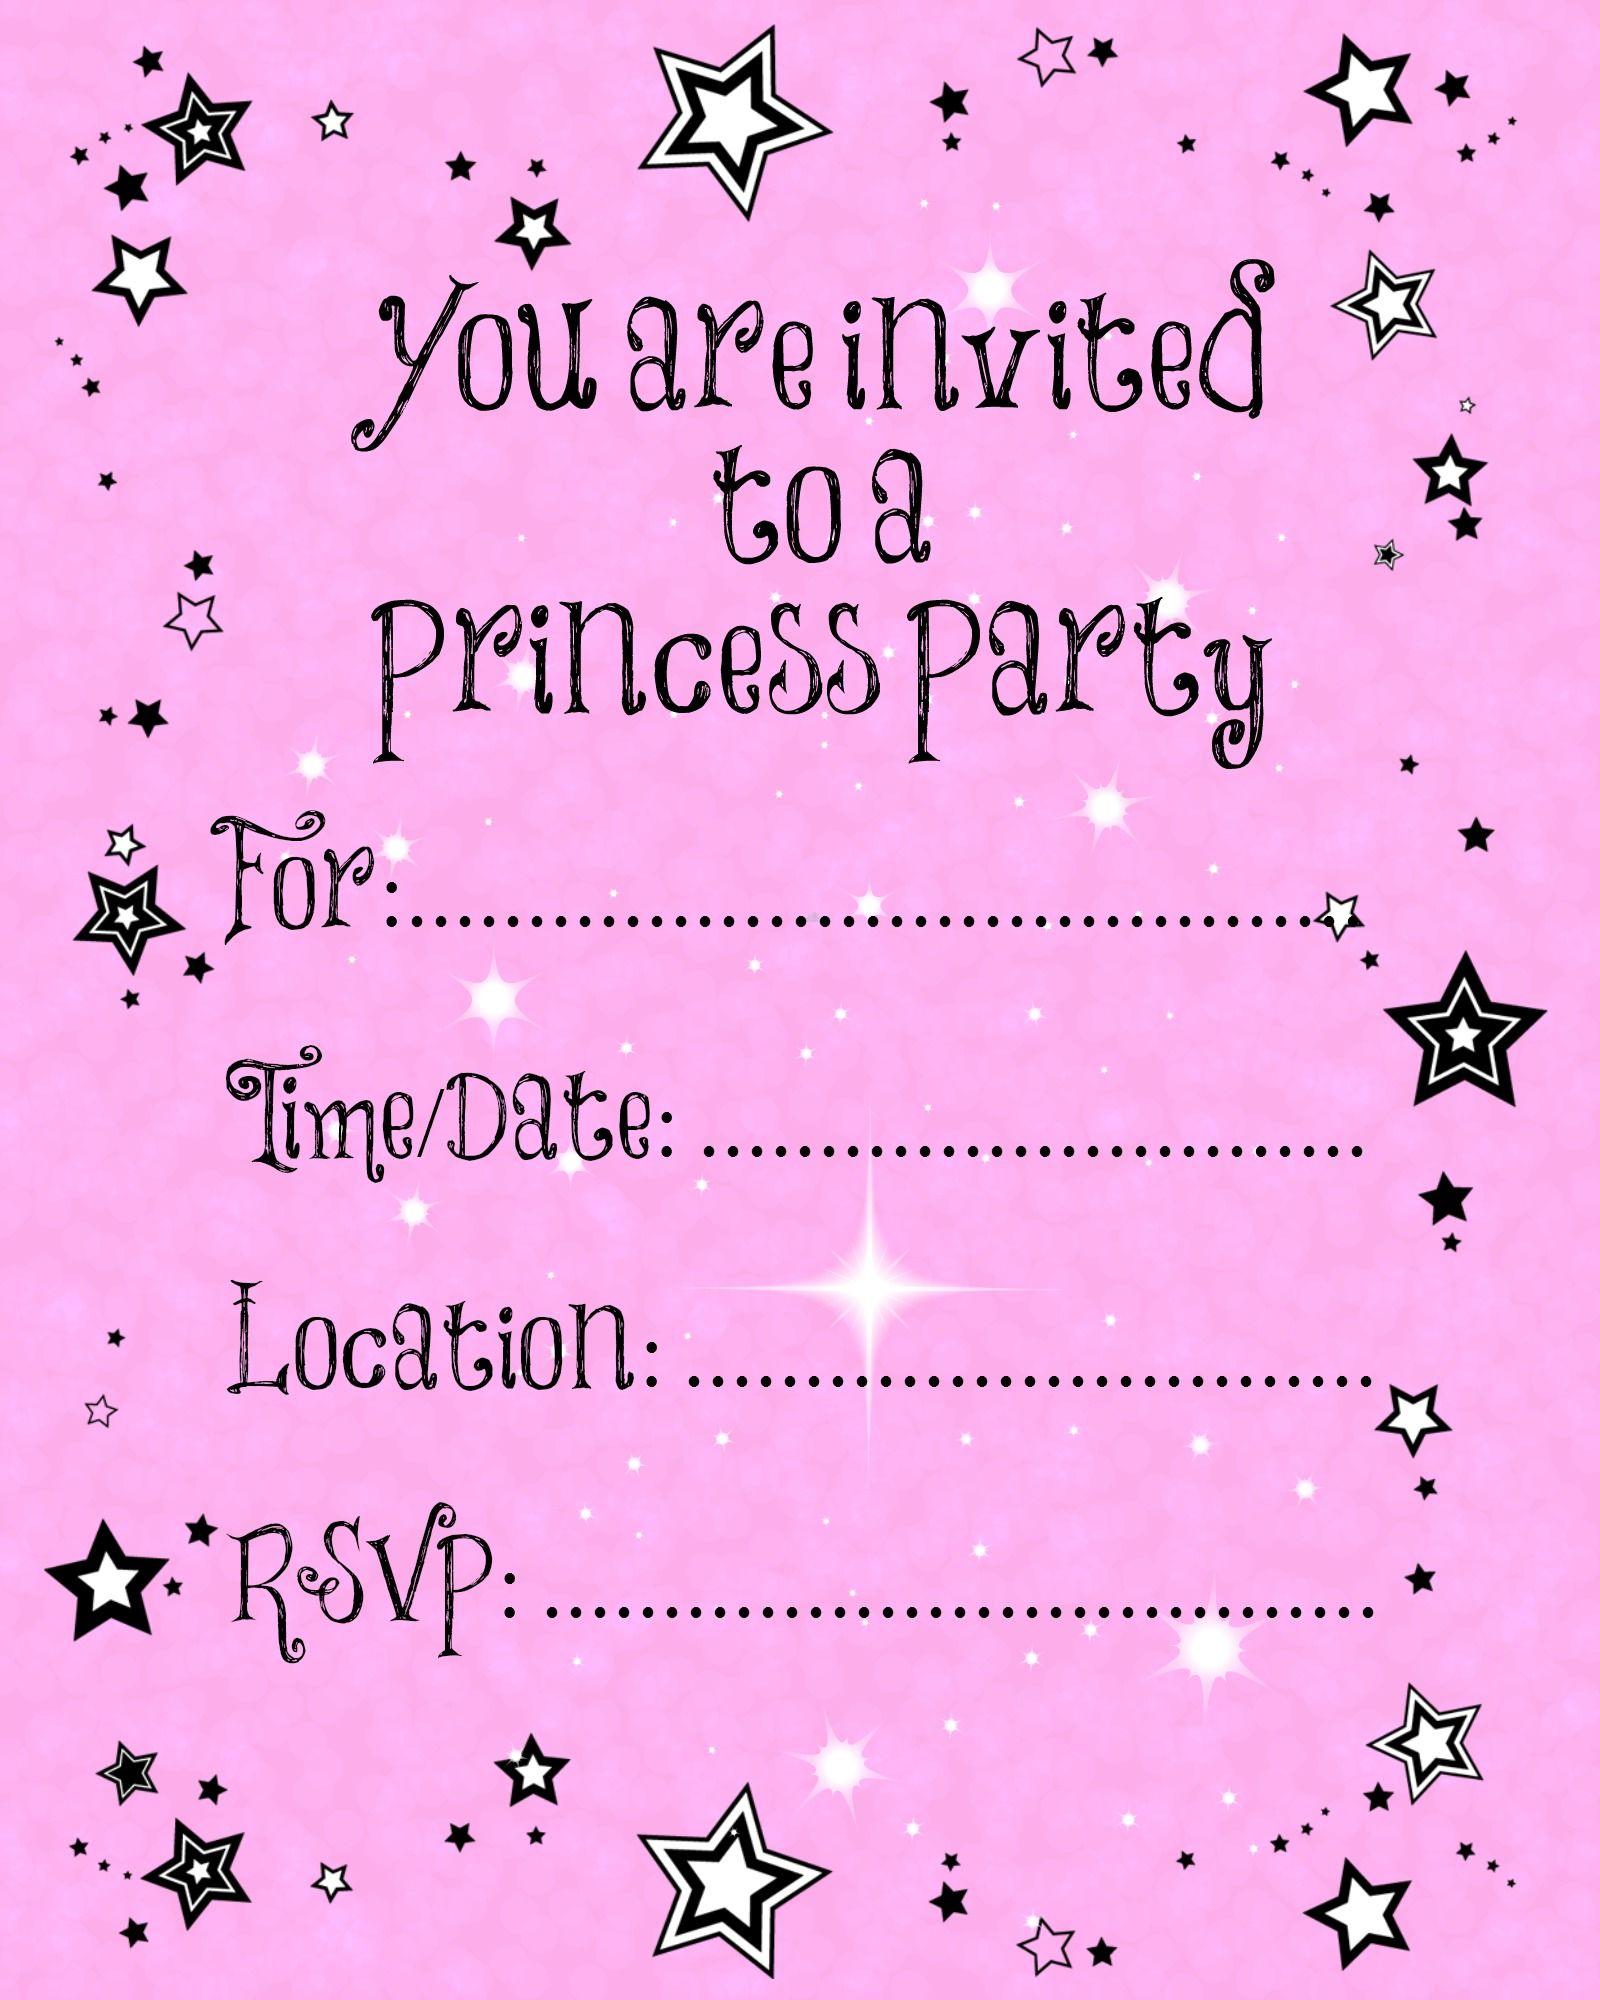 Free printable party invitations birthday invitation pinterest free printable party invitations filmwisefo Choice Image